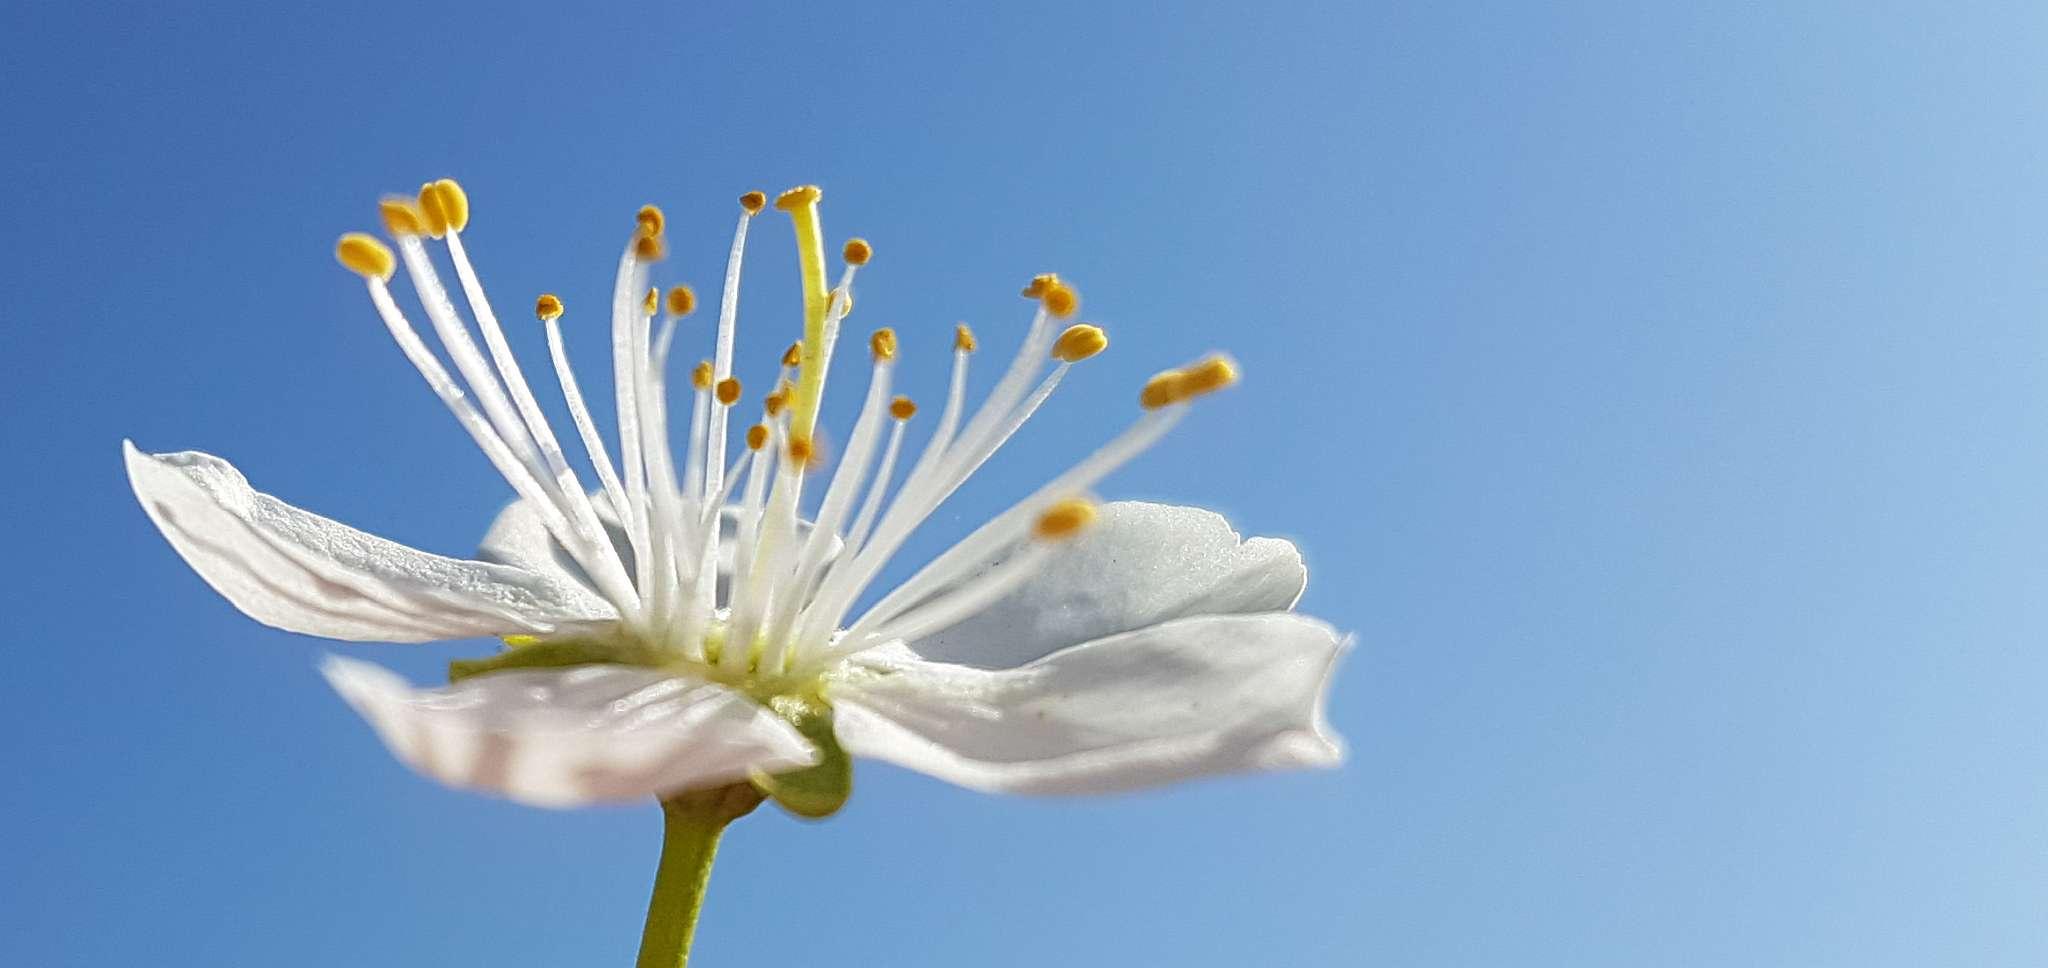 floare_sgs7_1